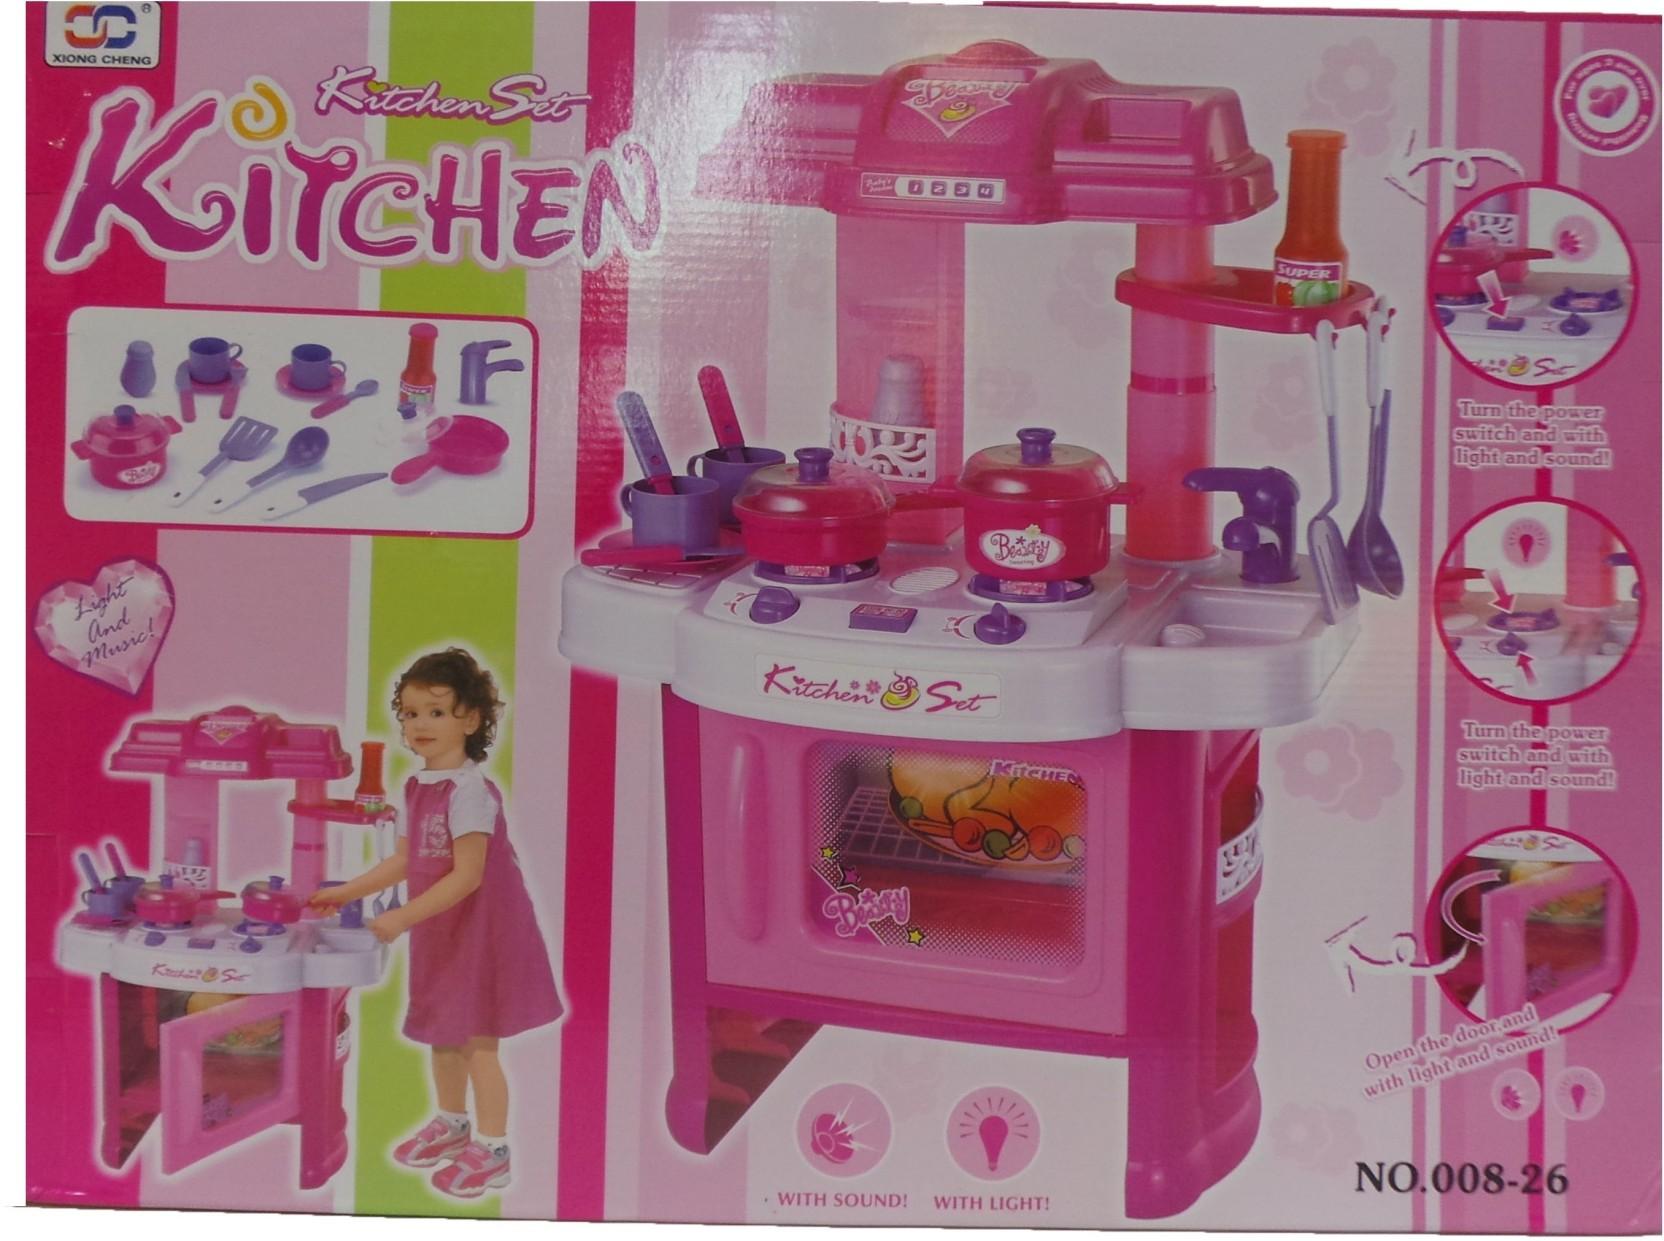 Toy mall new kitchen set new kitchen set shop for toy for Kitchen set on flipkart